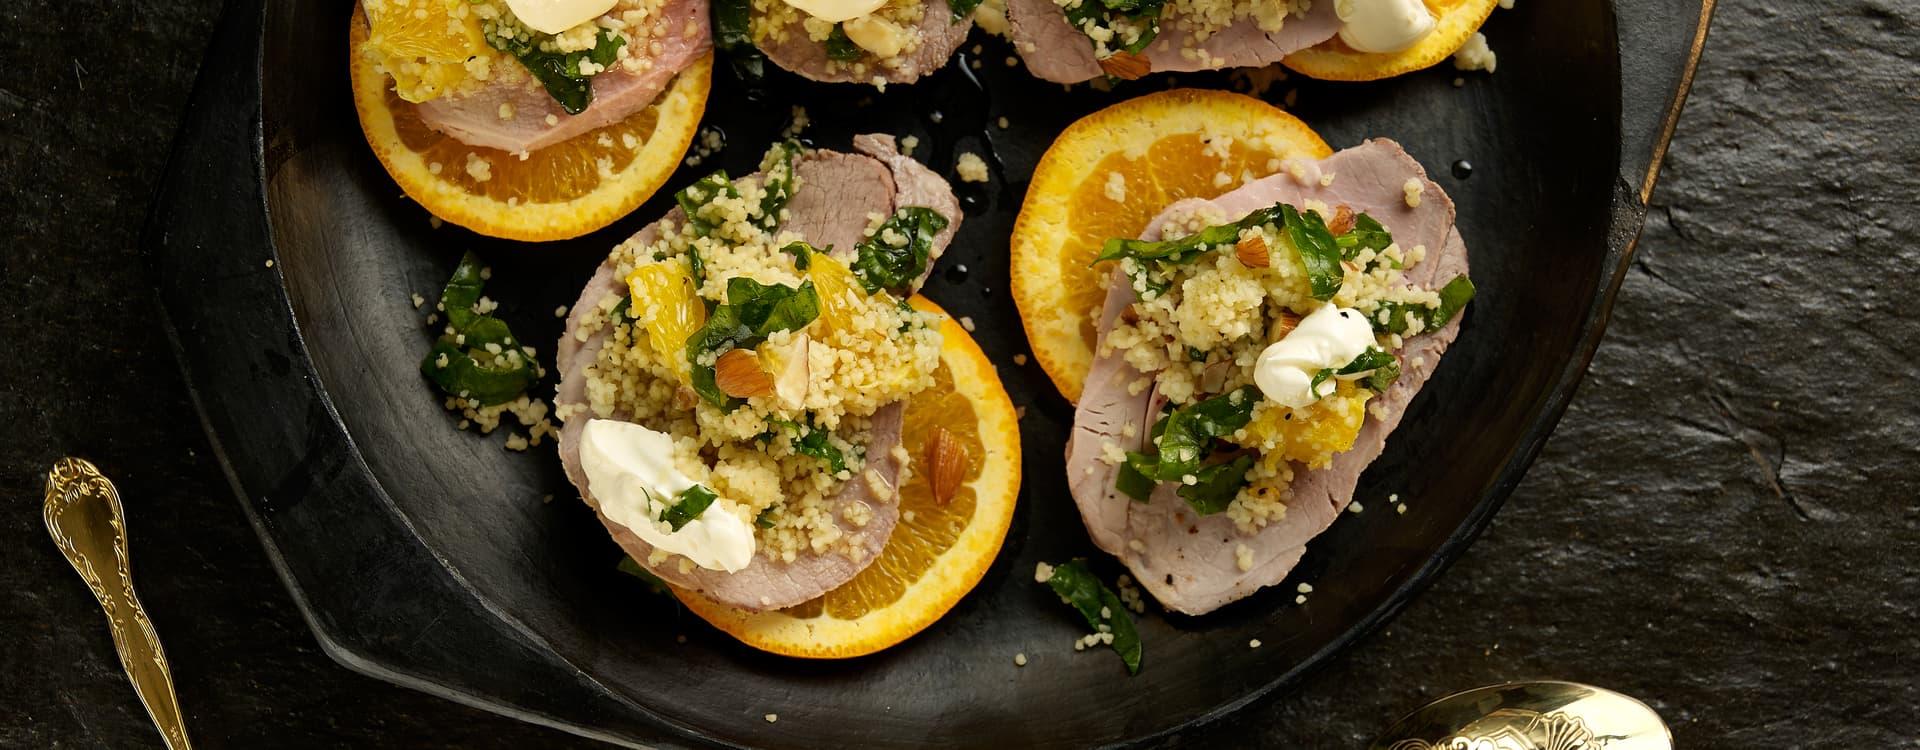 Koselig Jule-couscous med svin & appelsin